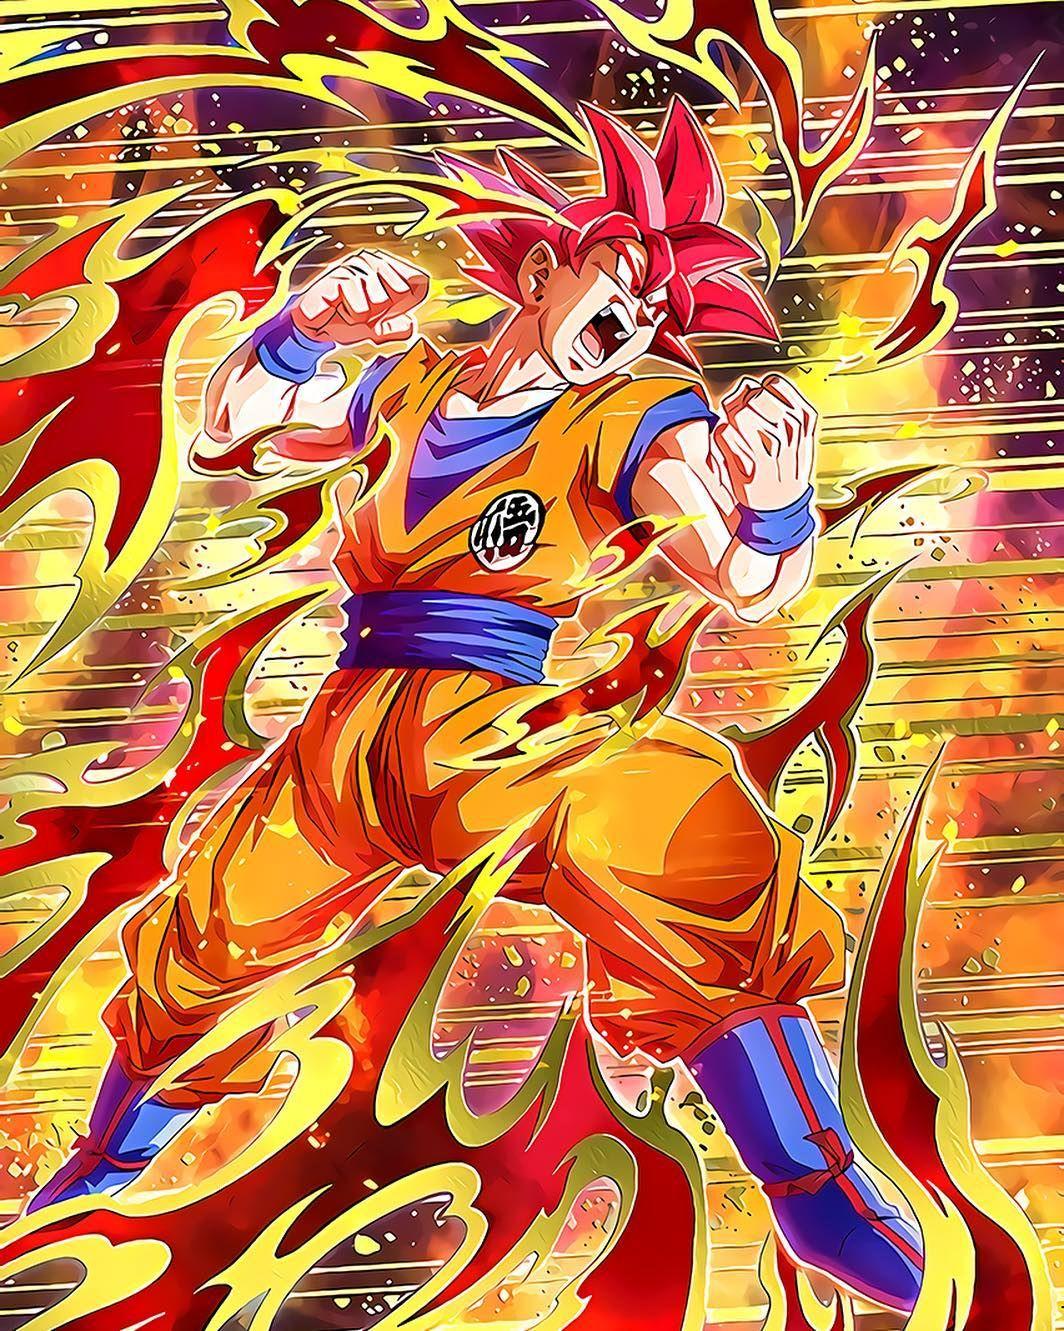 65e537a4a33611dbc673ec968f225231 - How To Get Super Saiyan God Goku In Dokkan Battle